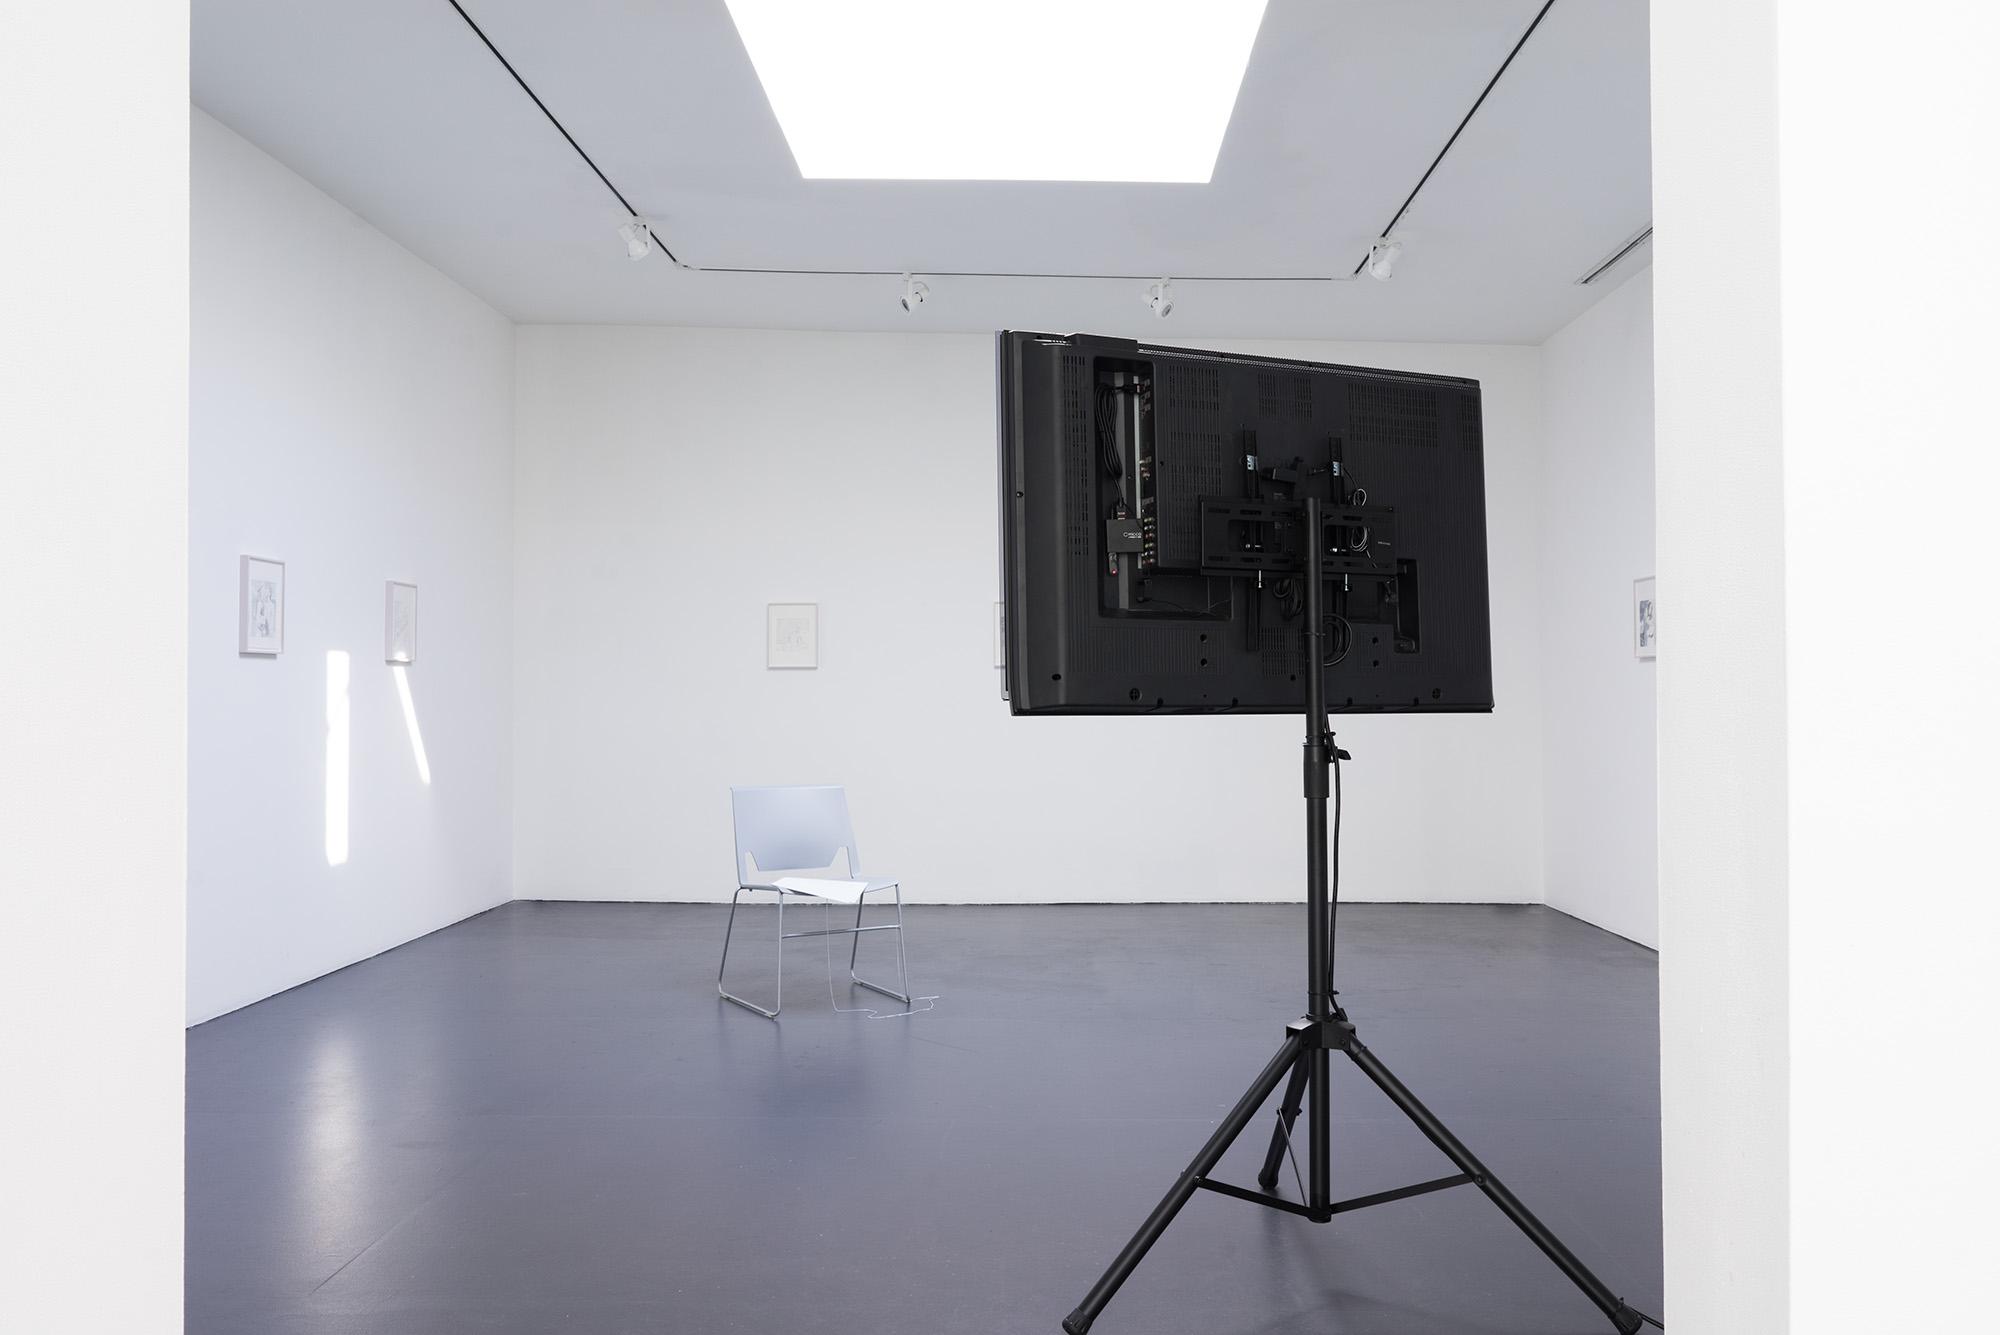 Installation view,  More than what I am providing , Friedemann Heckel & Luzie Meyer